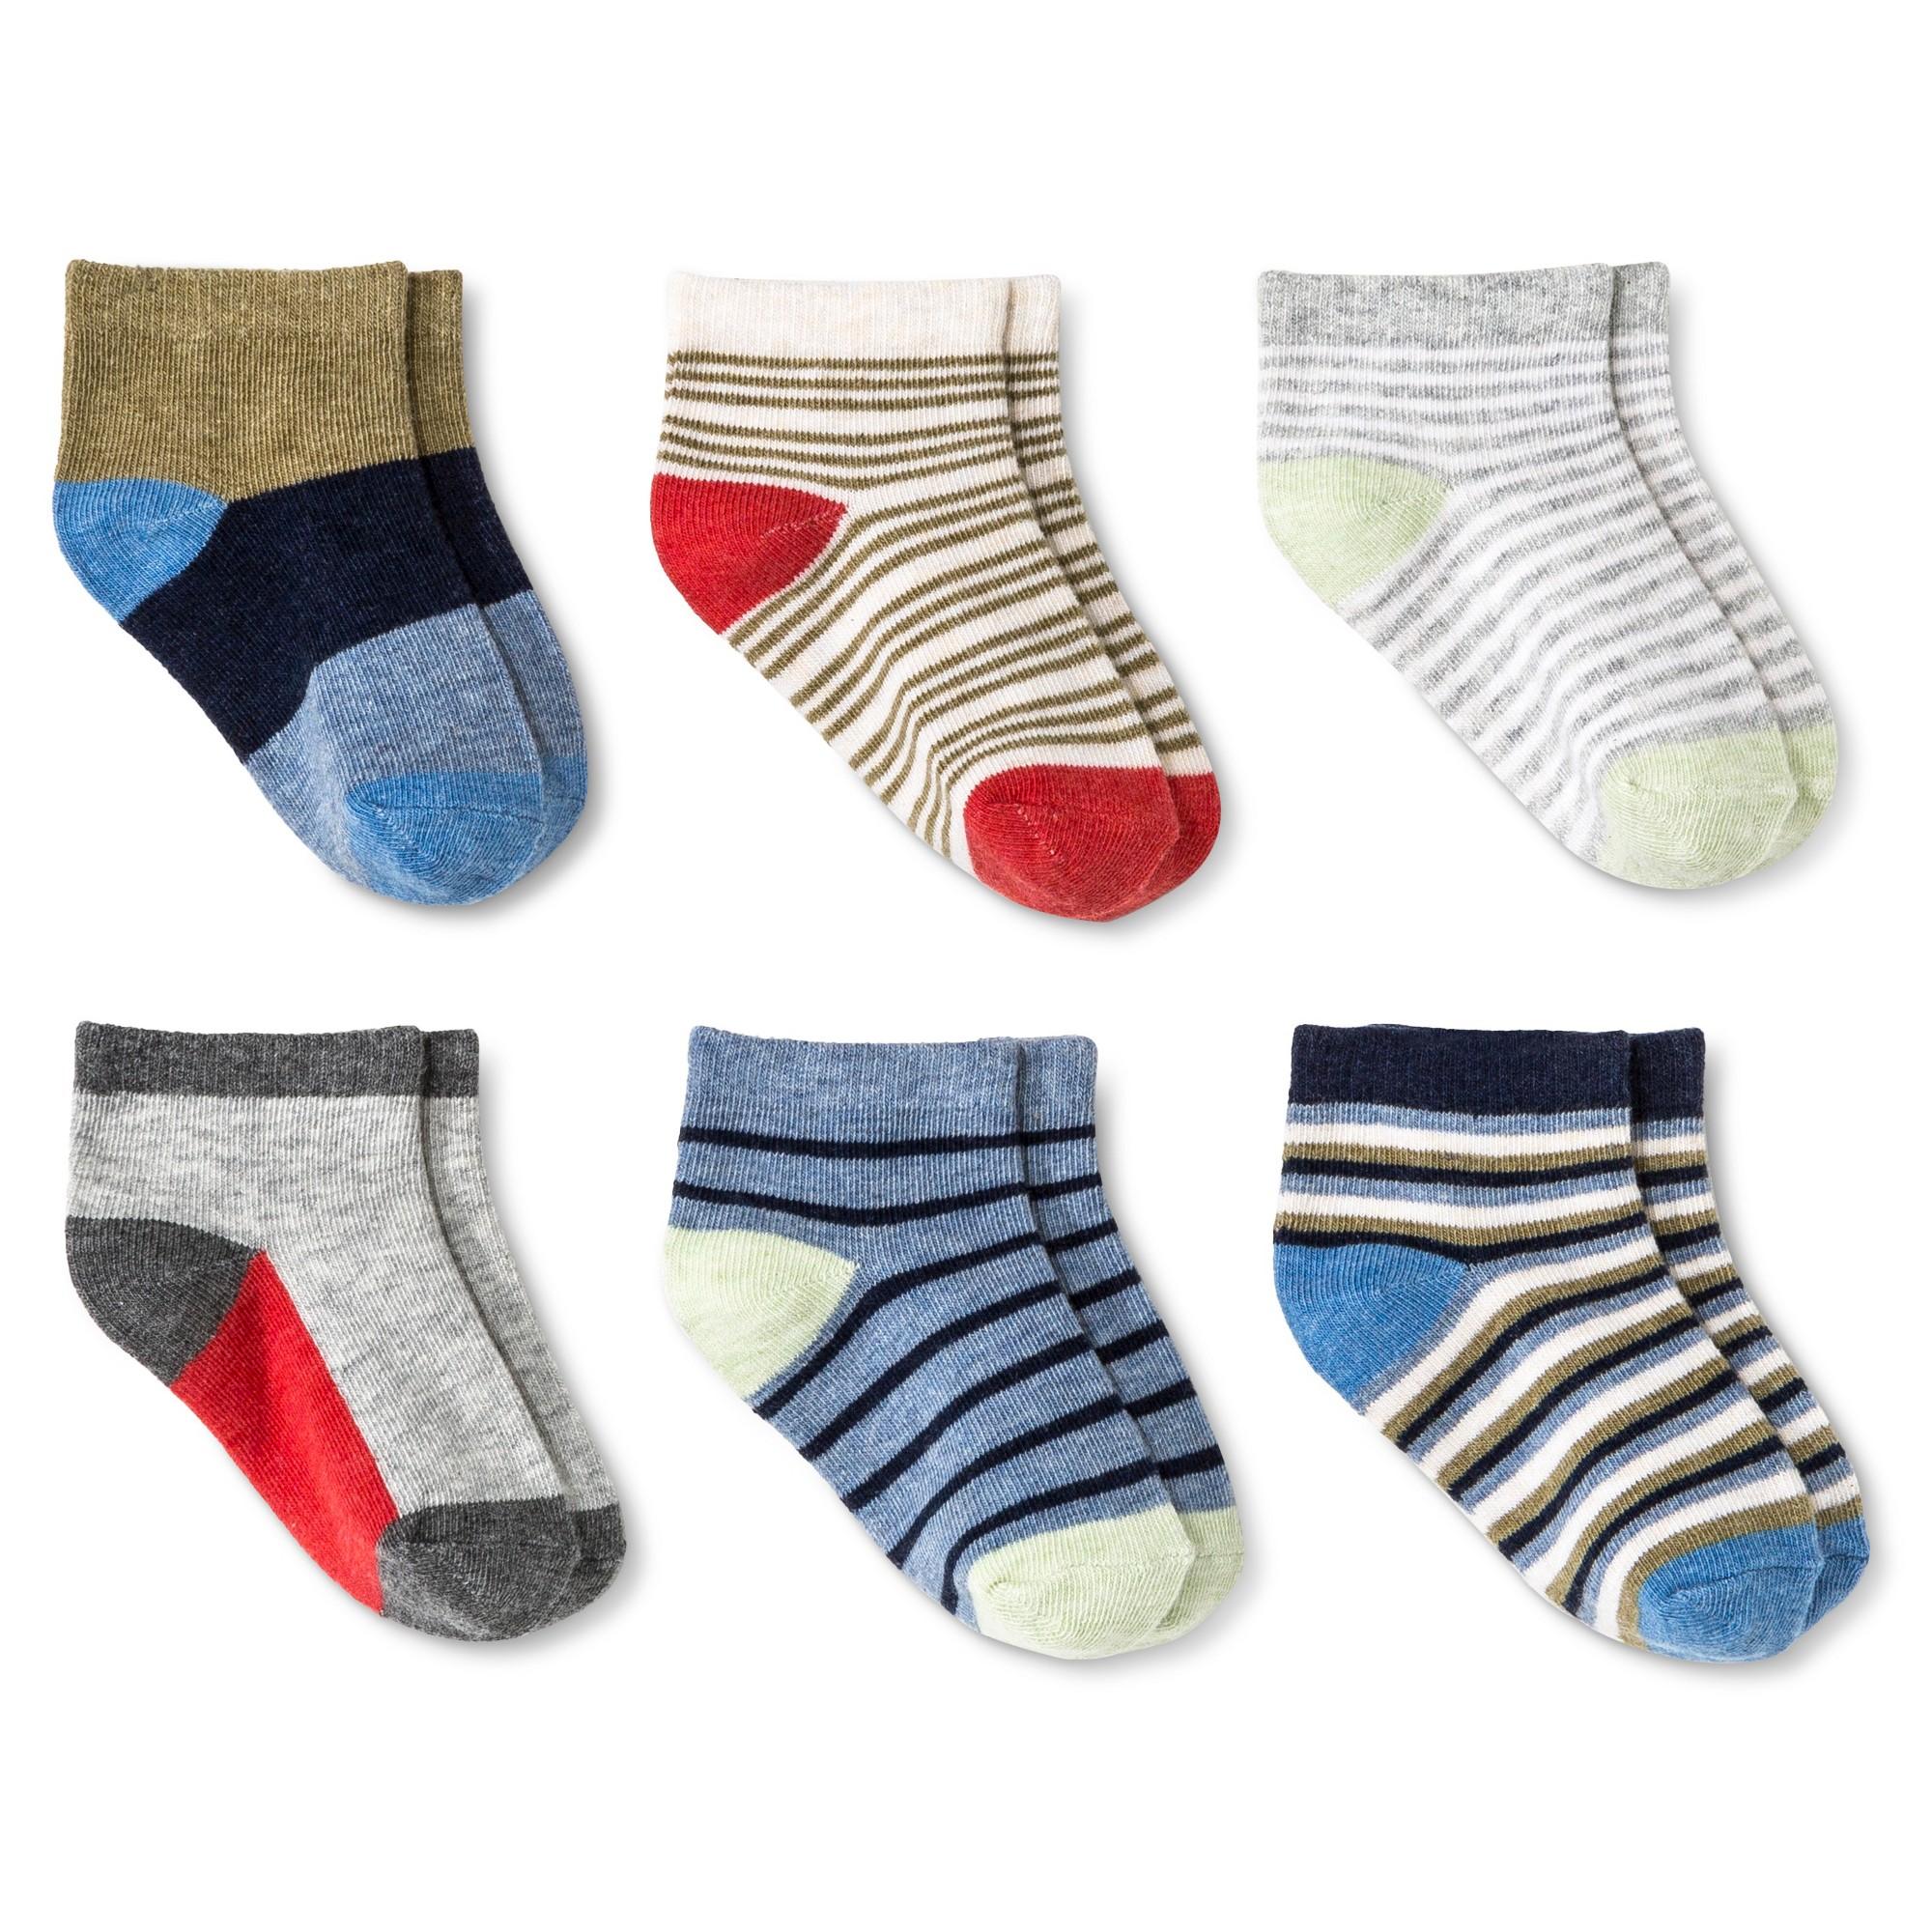 Baby Boys Multicolored Stripe Low Cut Dress Socks 6 pk Circo